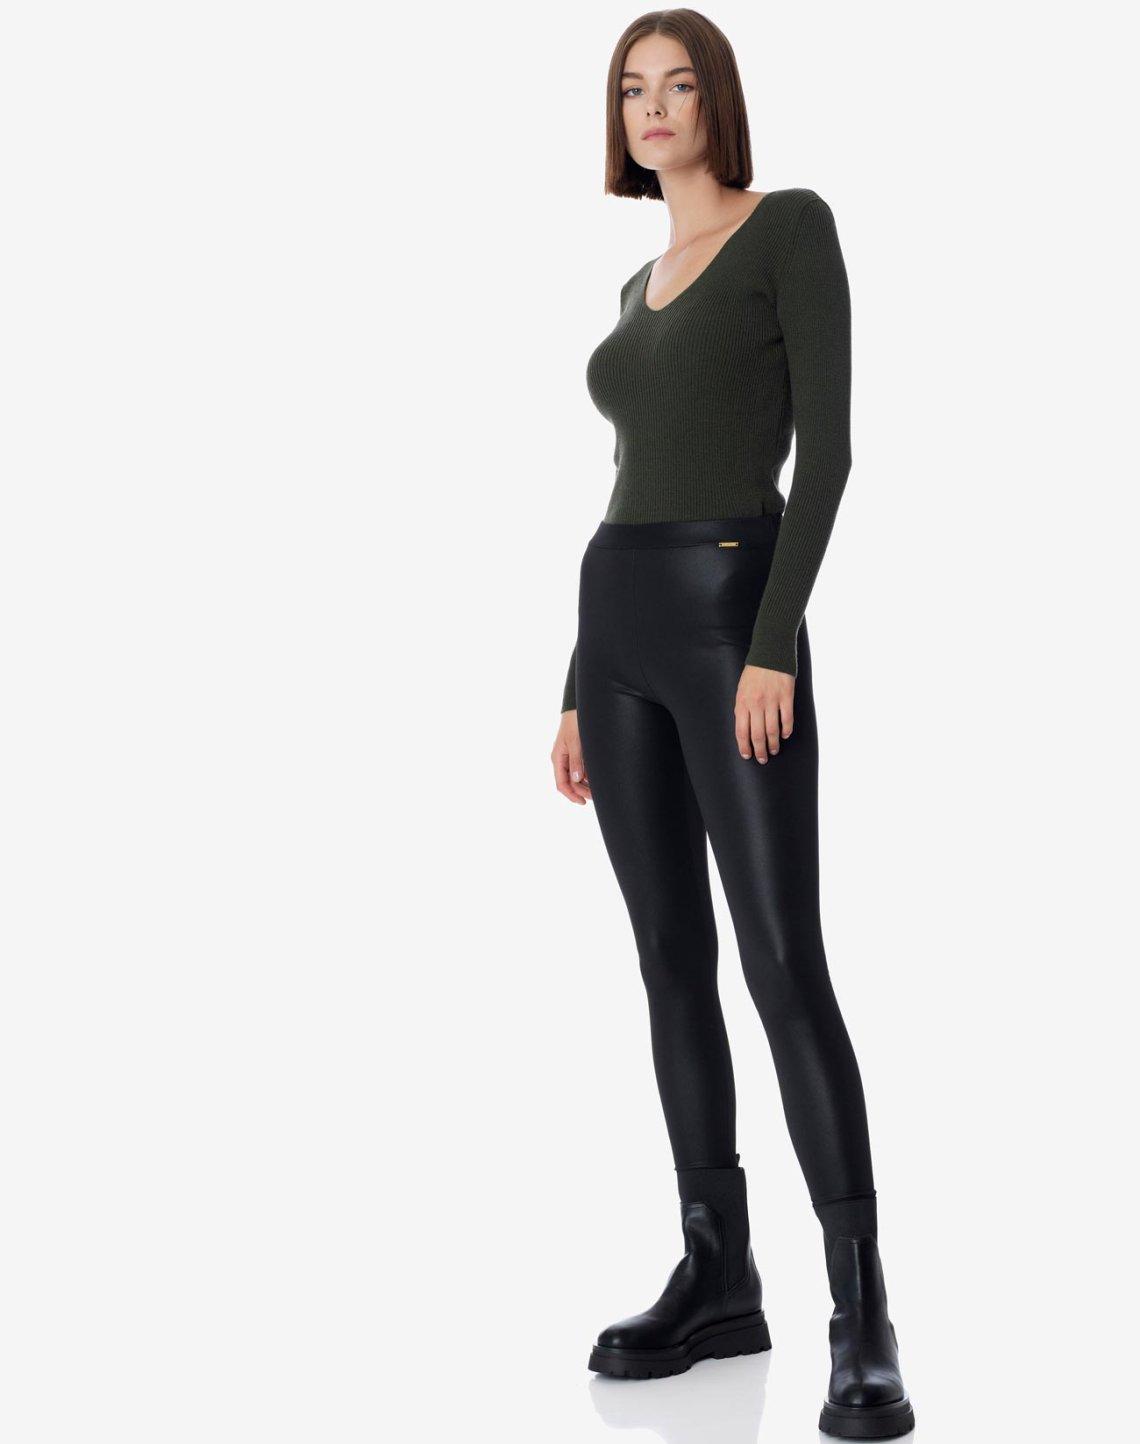 Faux leather leggings